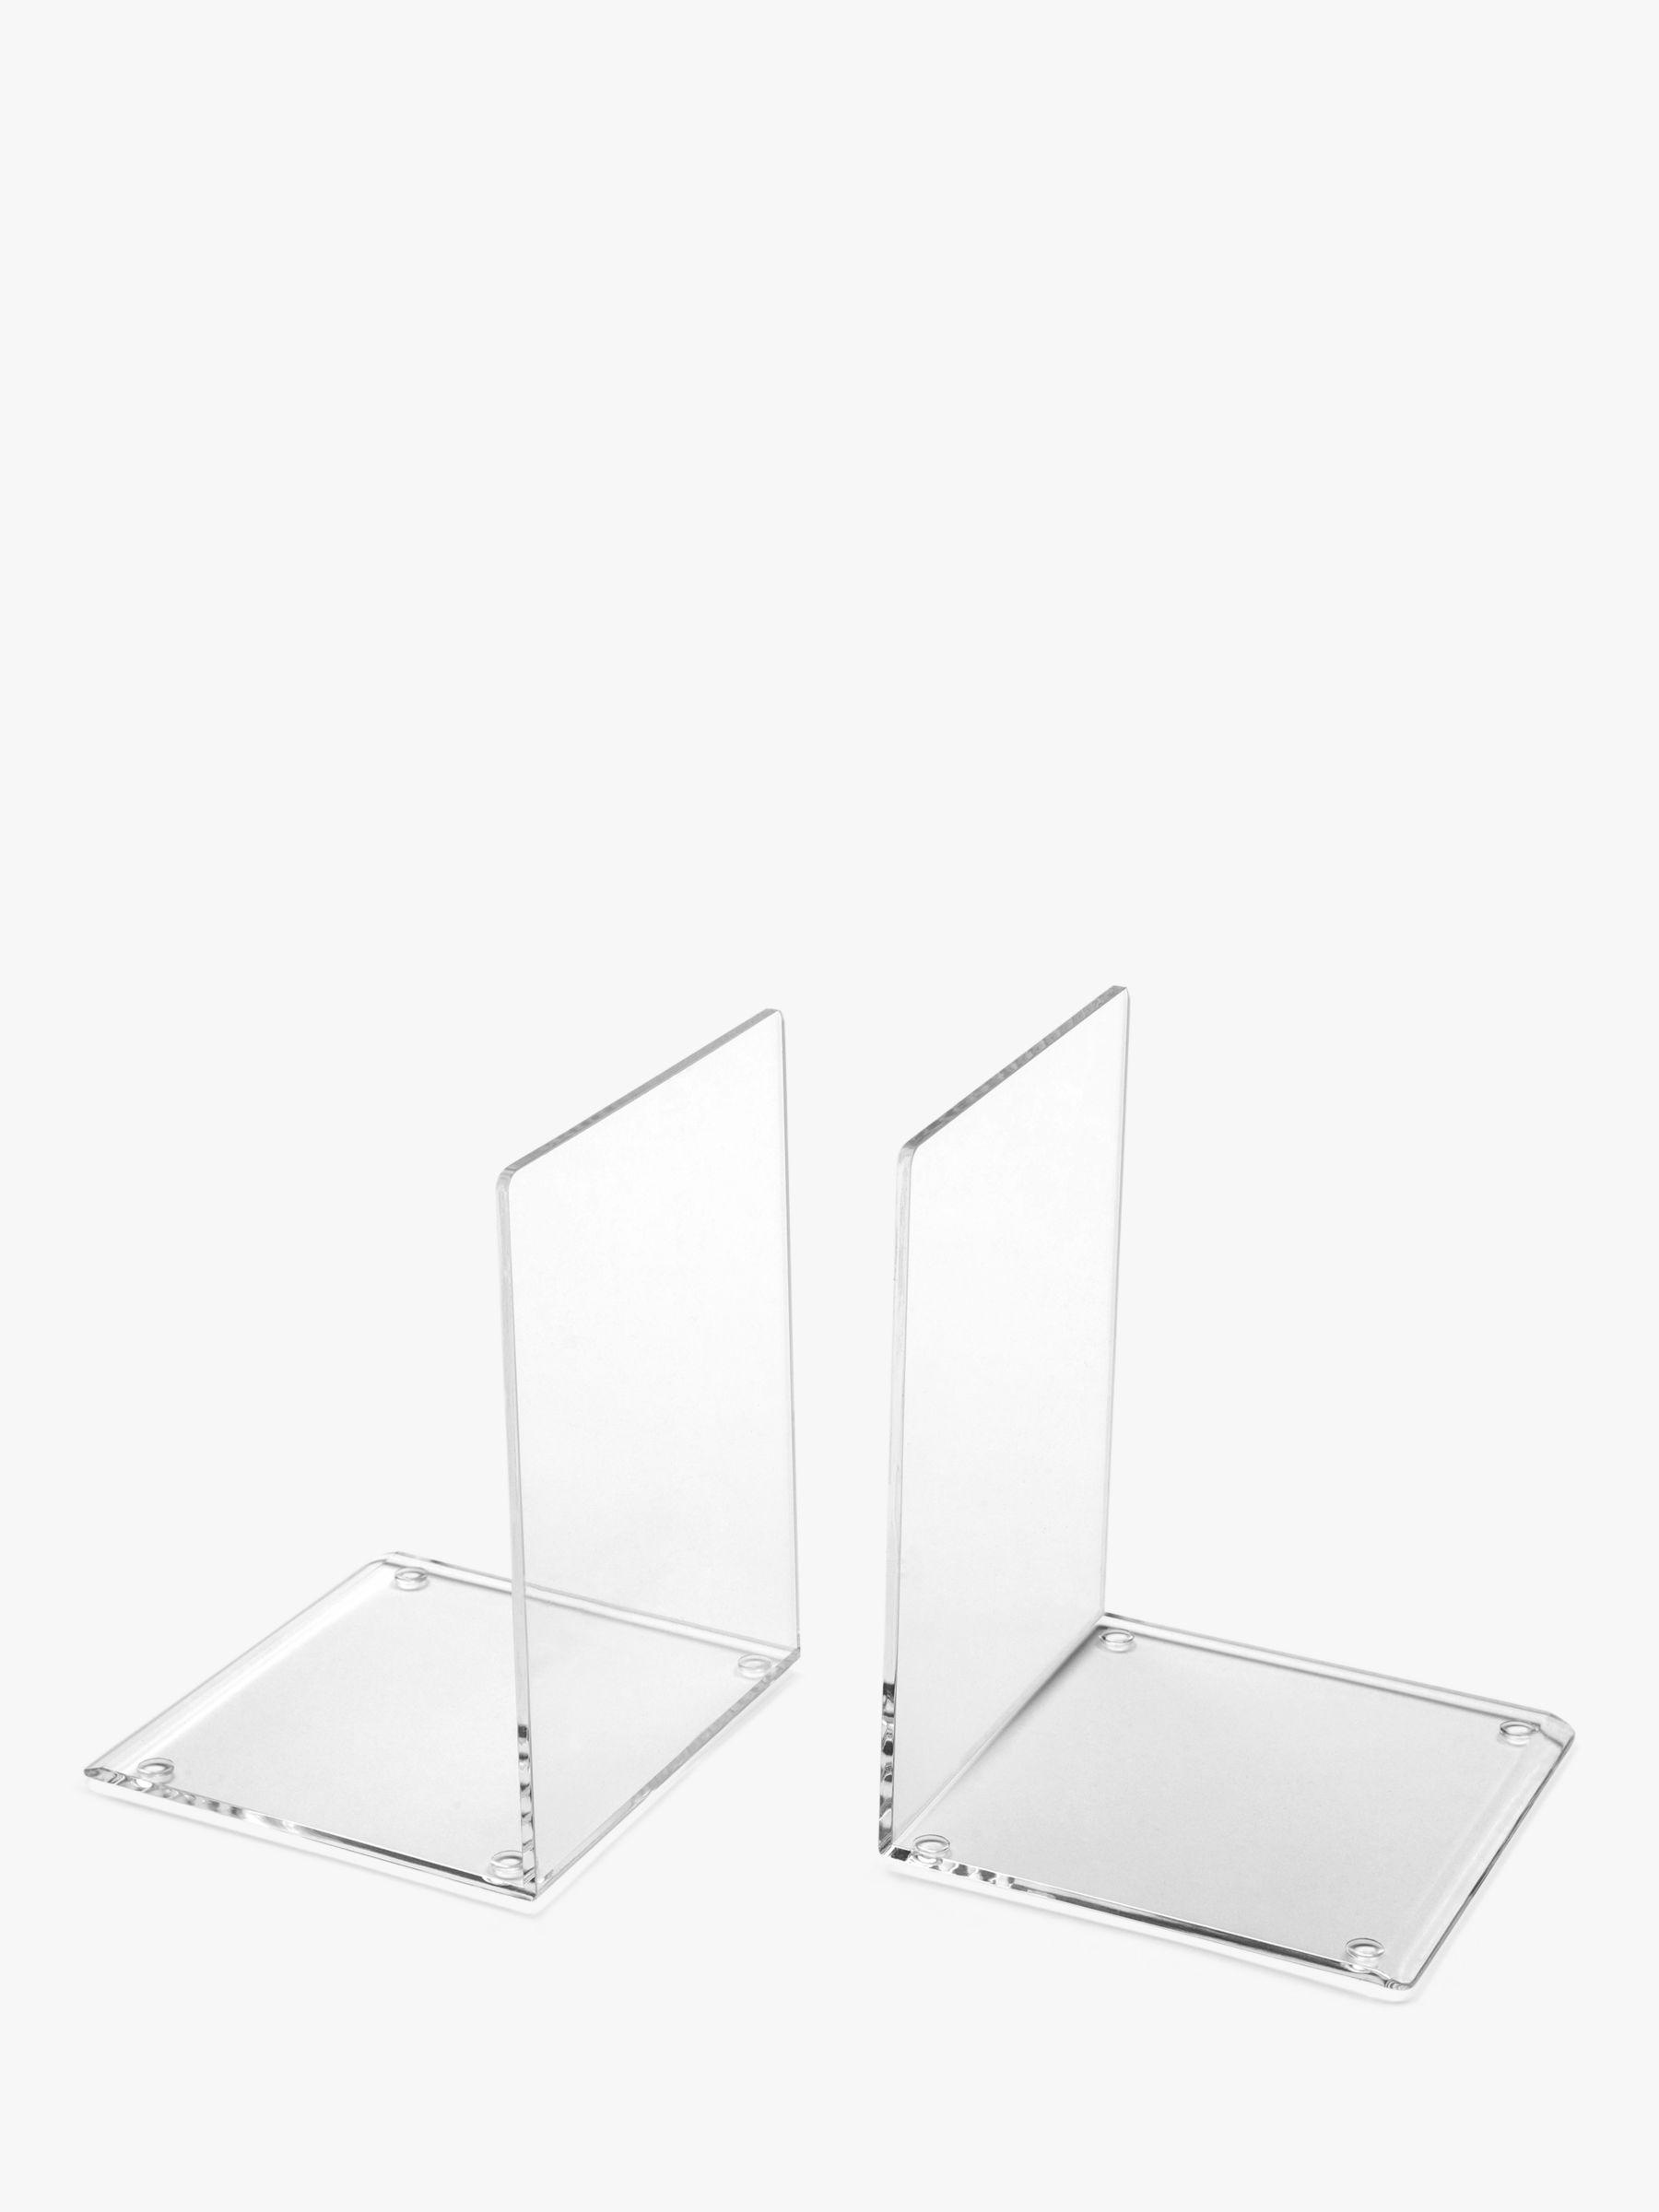 Osco Osco Acrylic Bookends, Set of 2, Clear